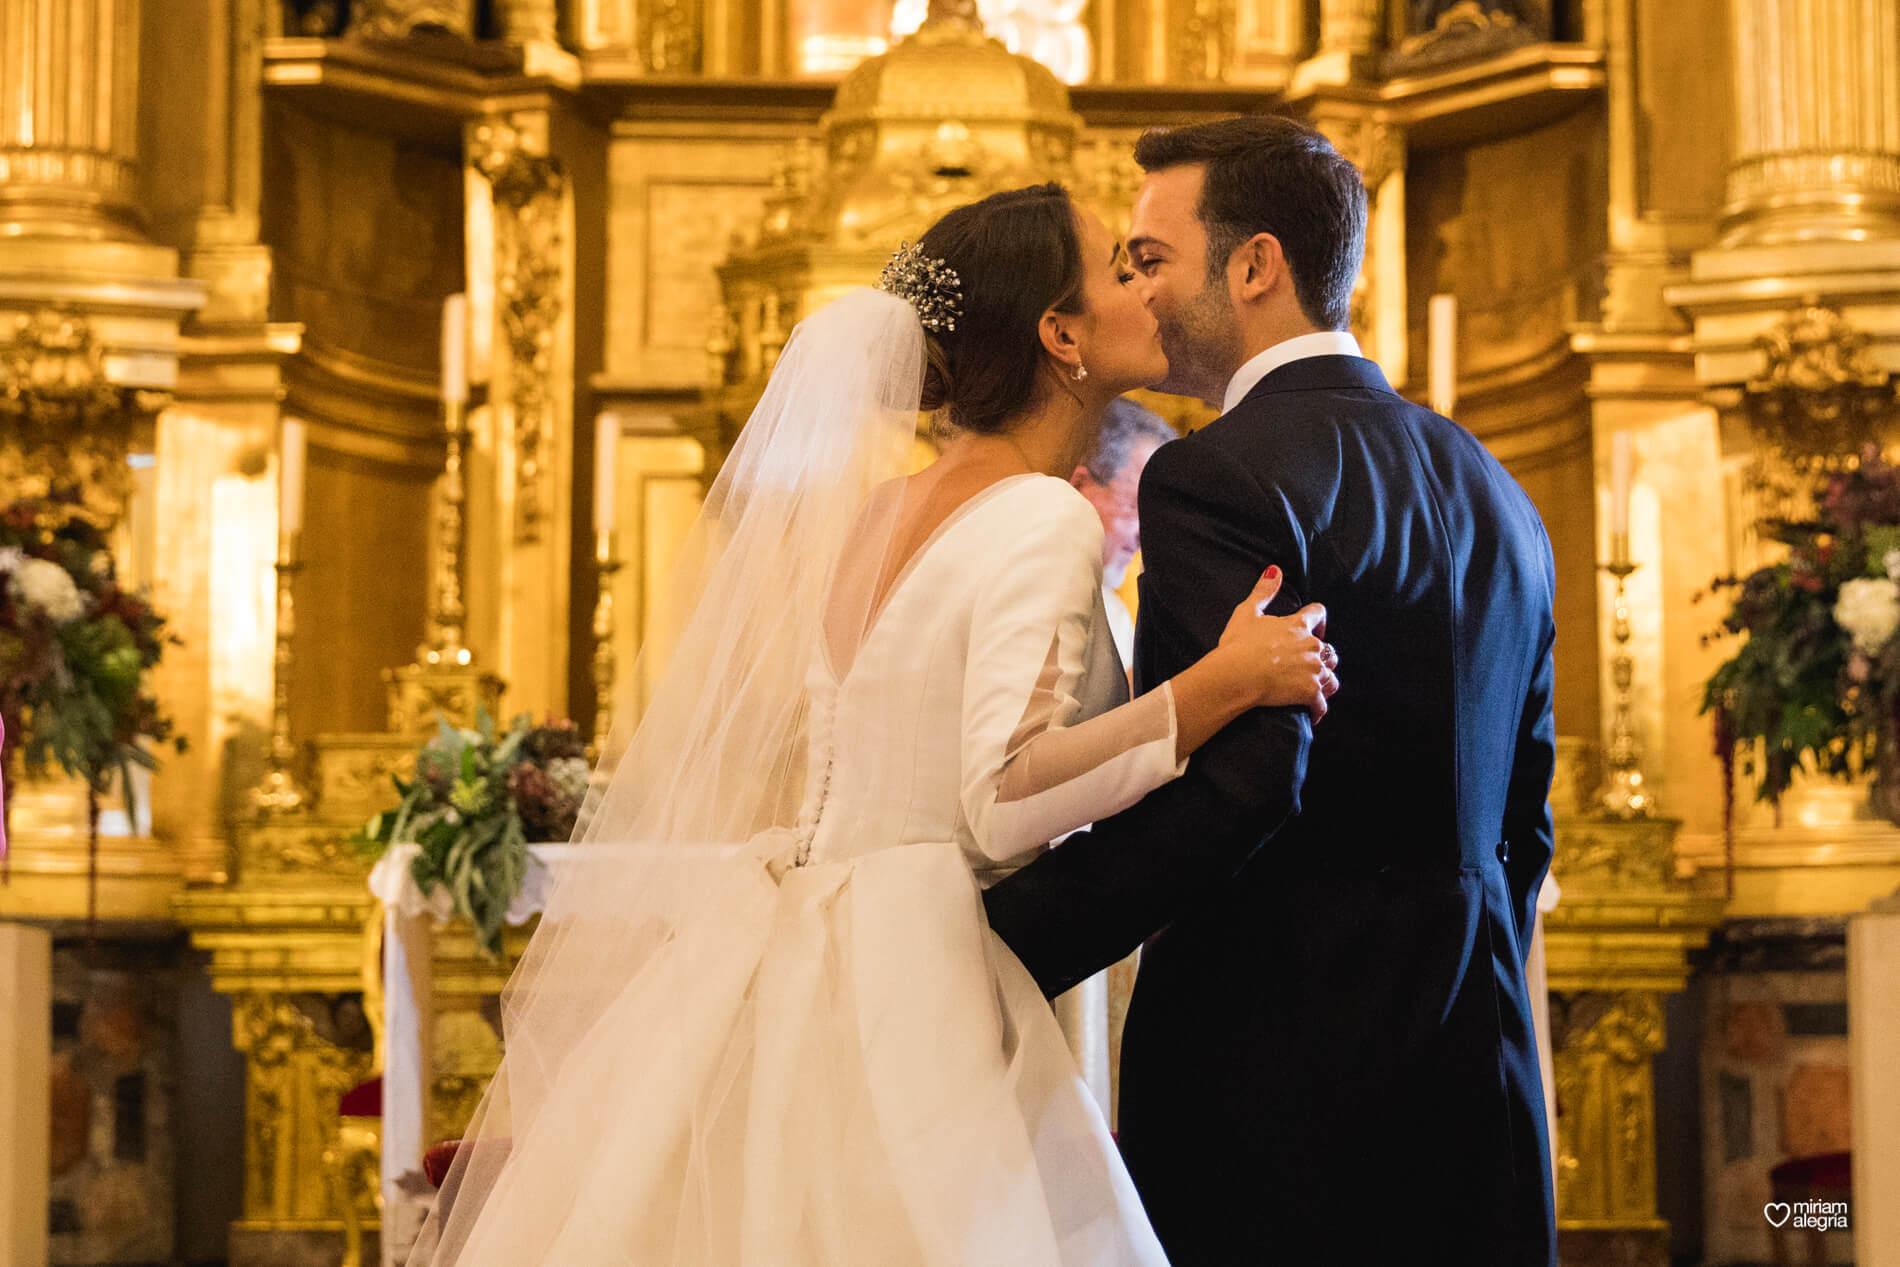 vestido-de-novia-paula-del-vas-miriam-alegria-fotografos-boda-murcia-65